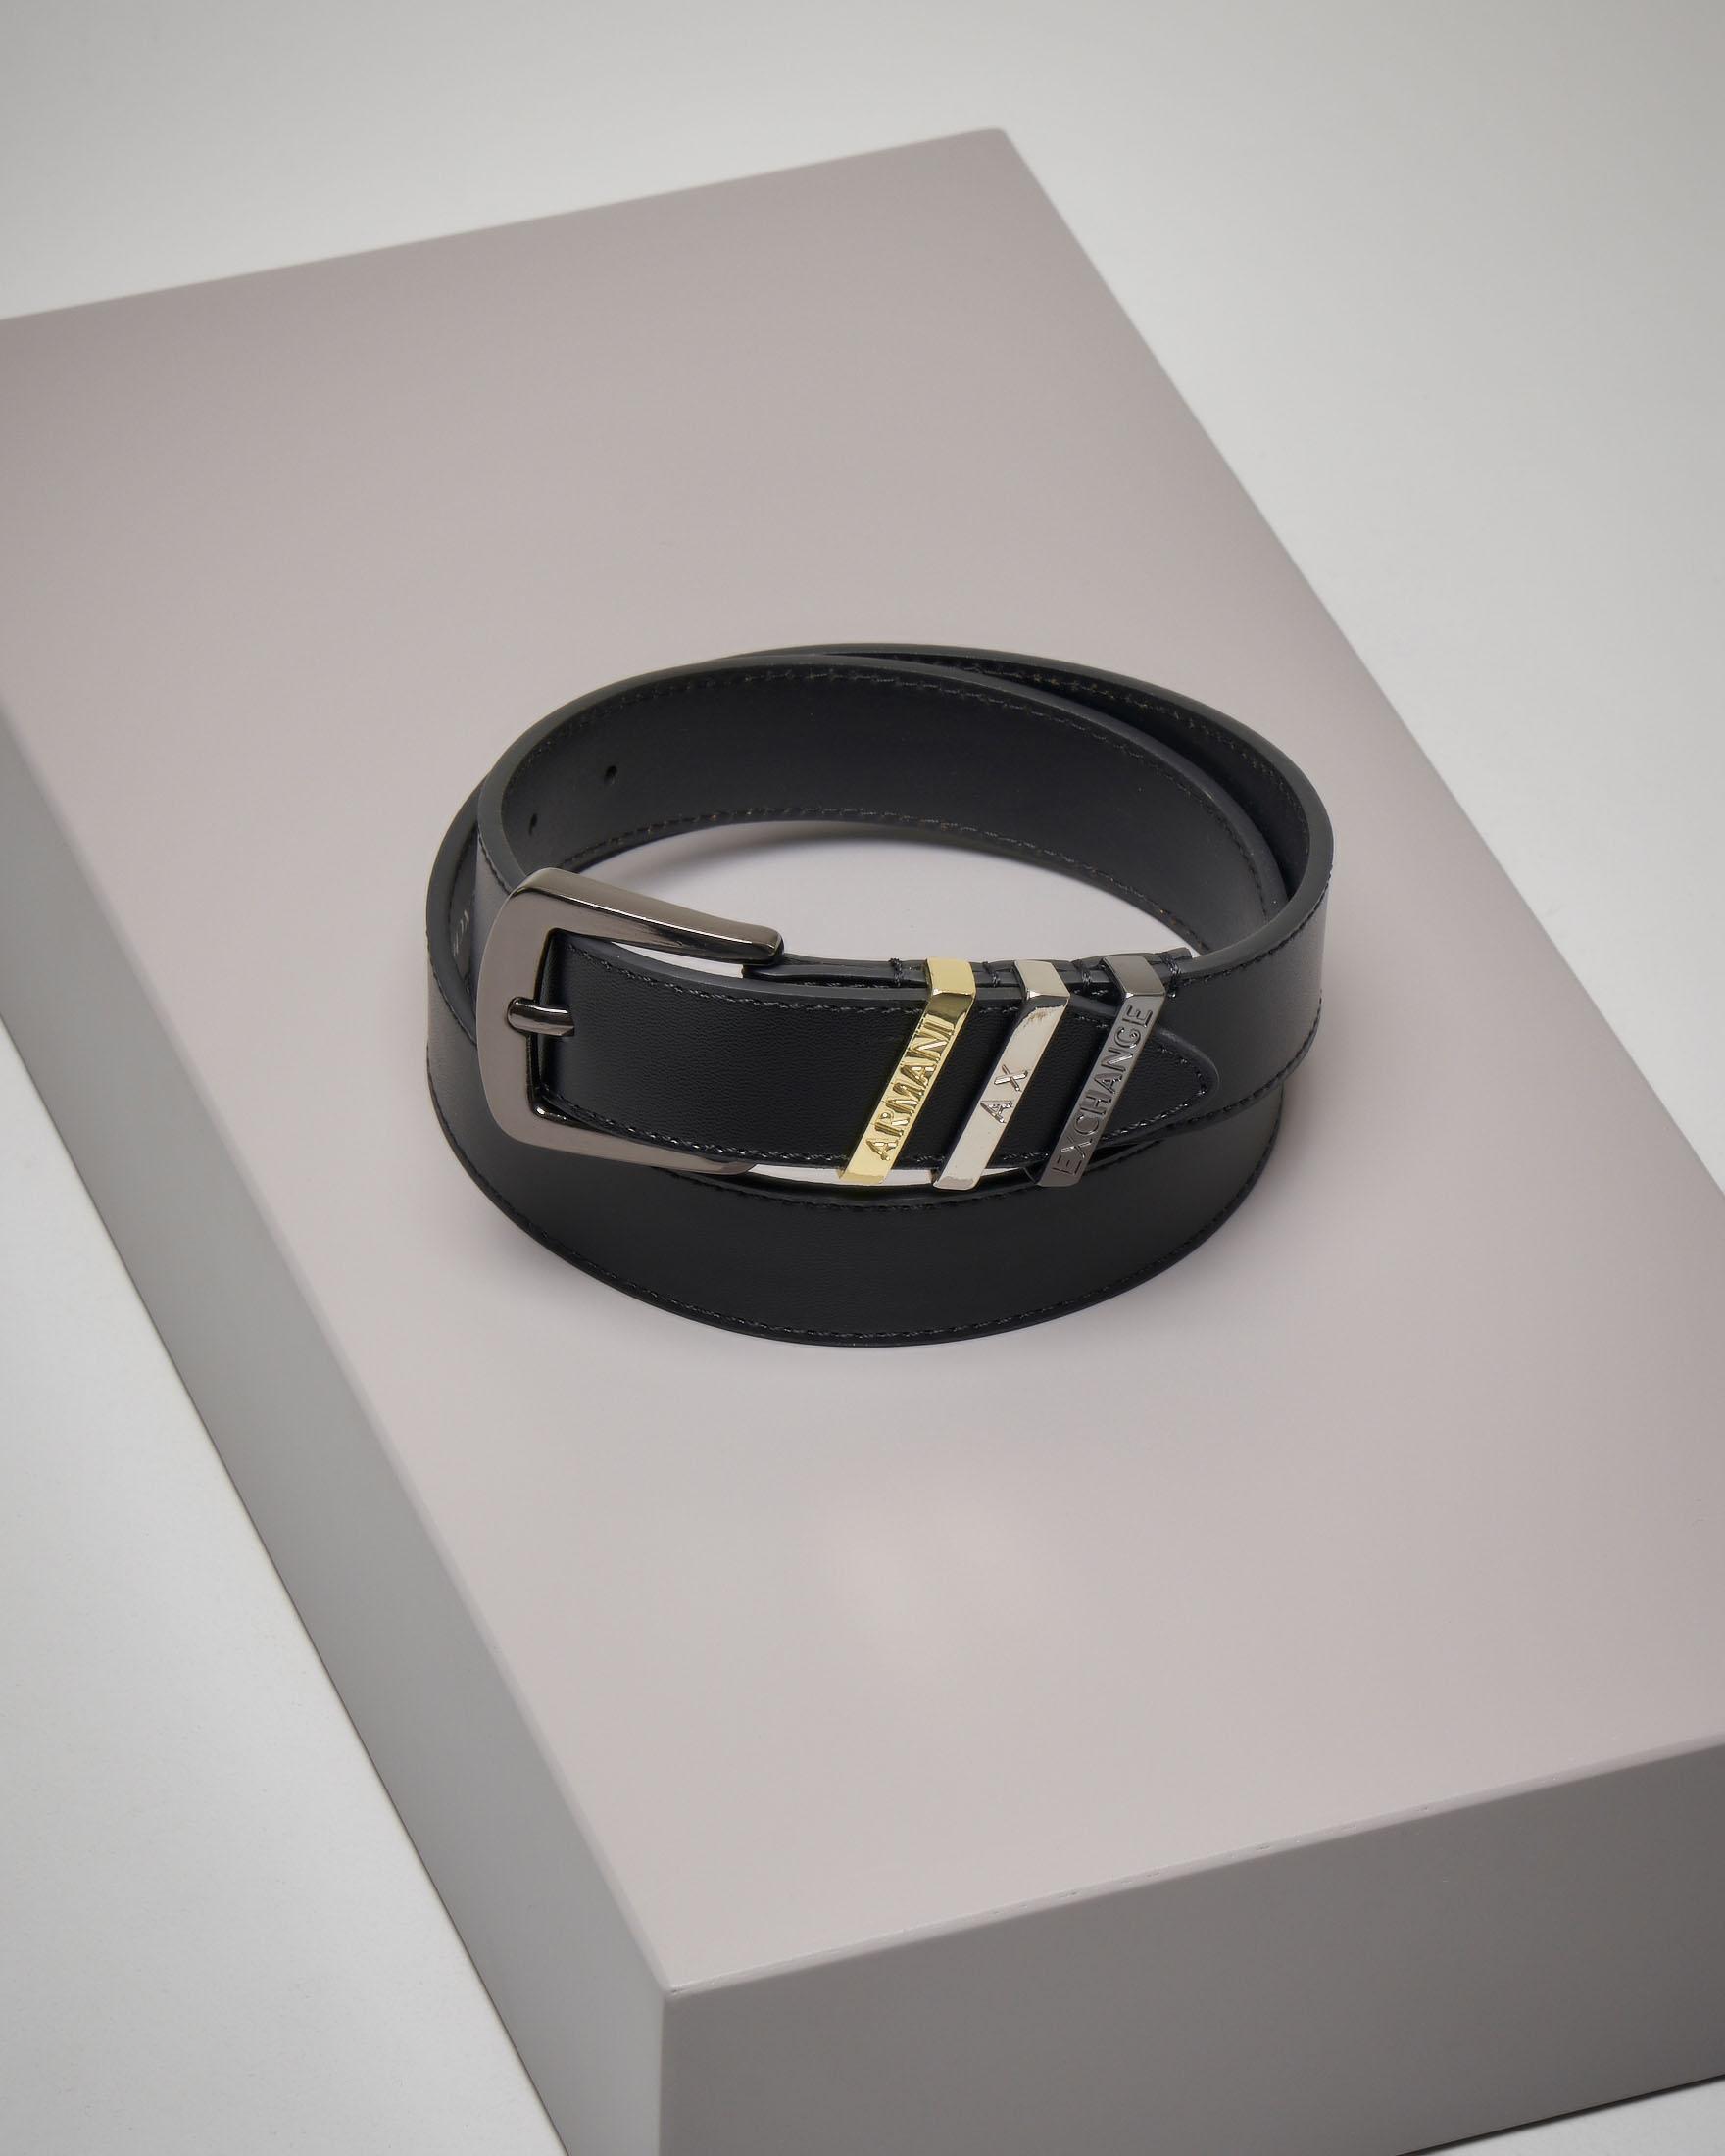 Cintura in pelle nera con impunture